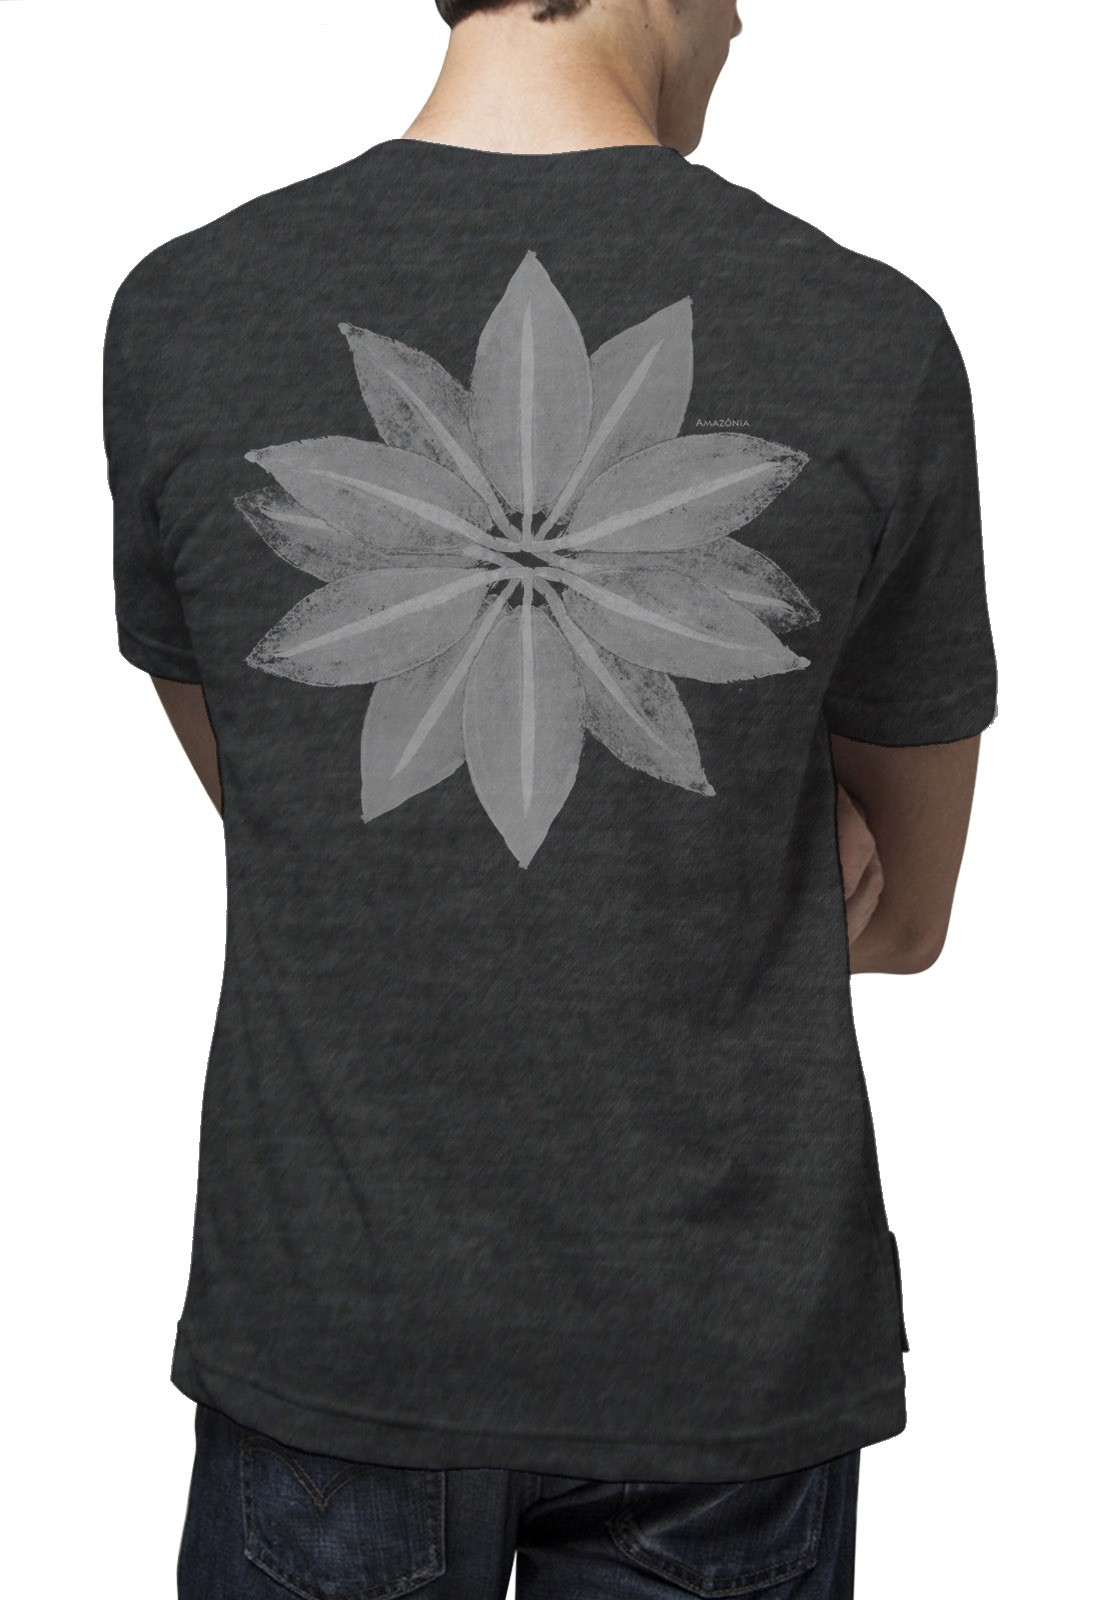 Camiseta Amazônia Flor Amazônica - Mescla